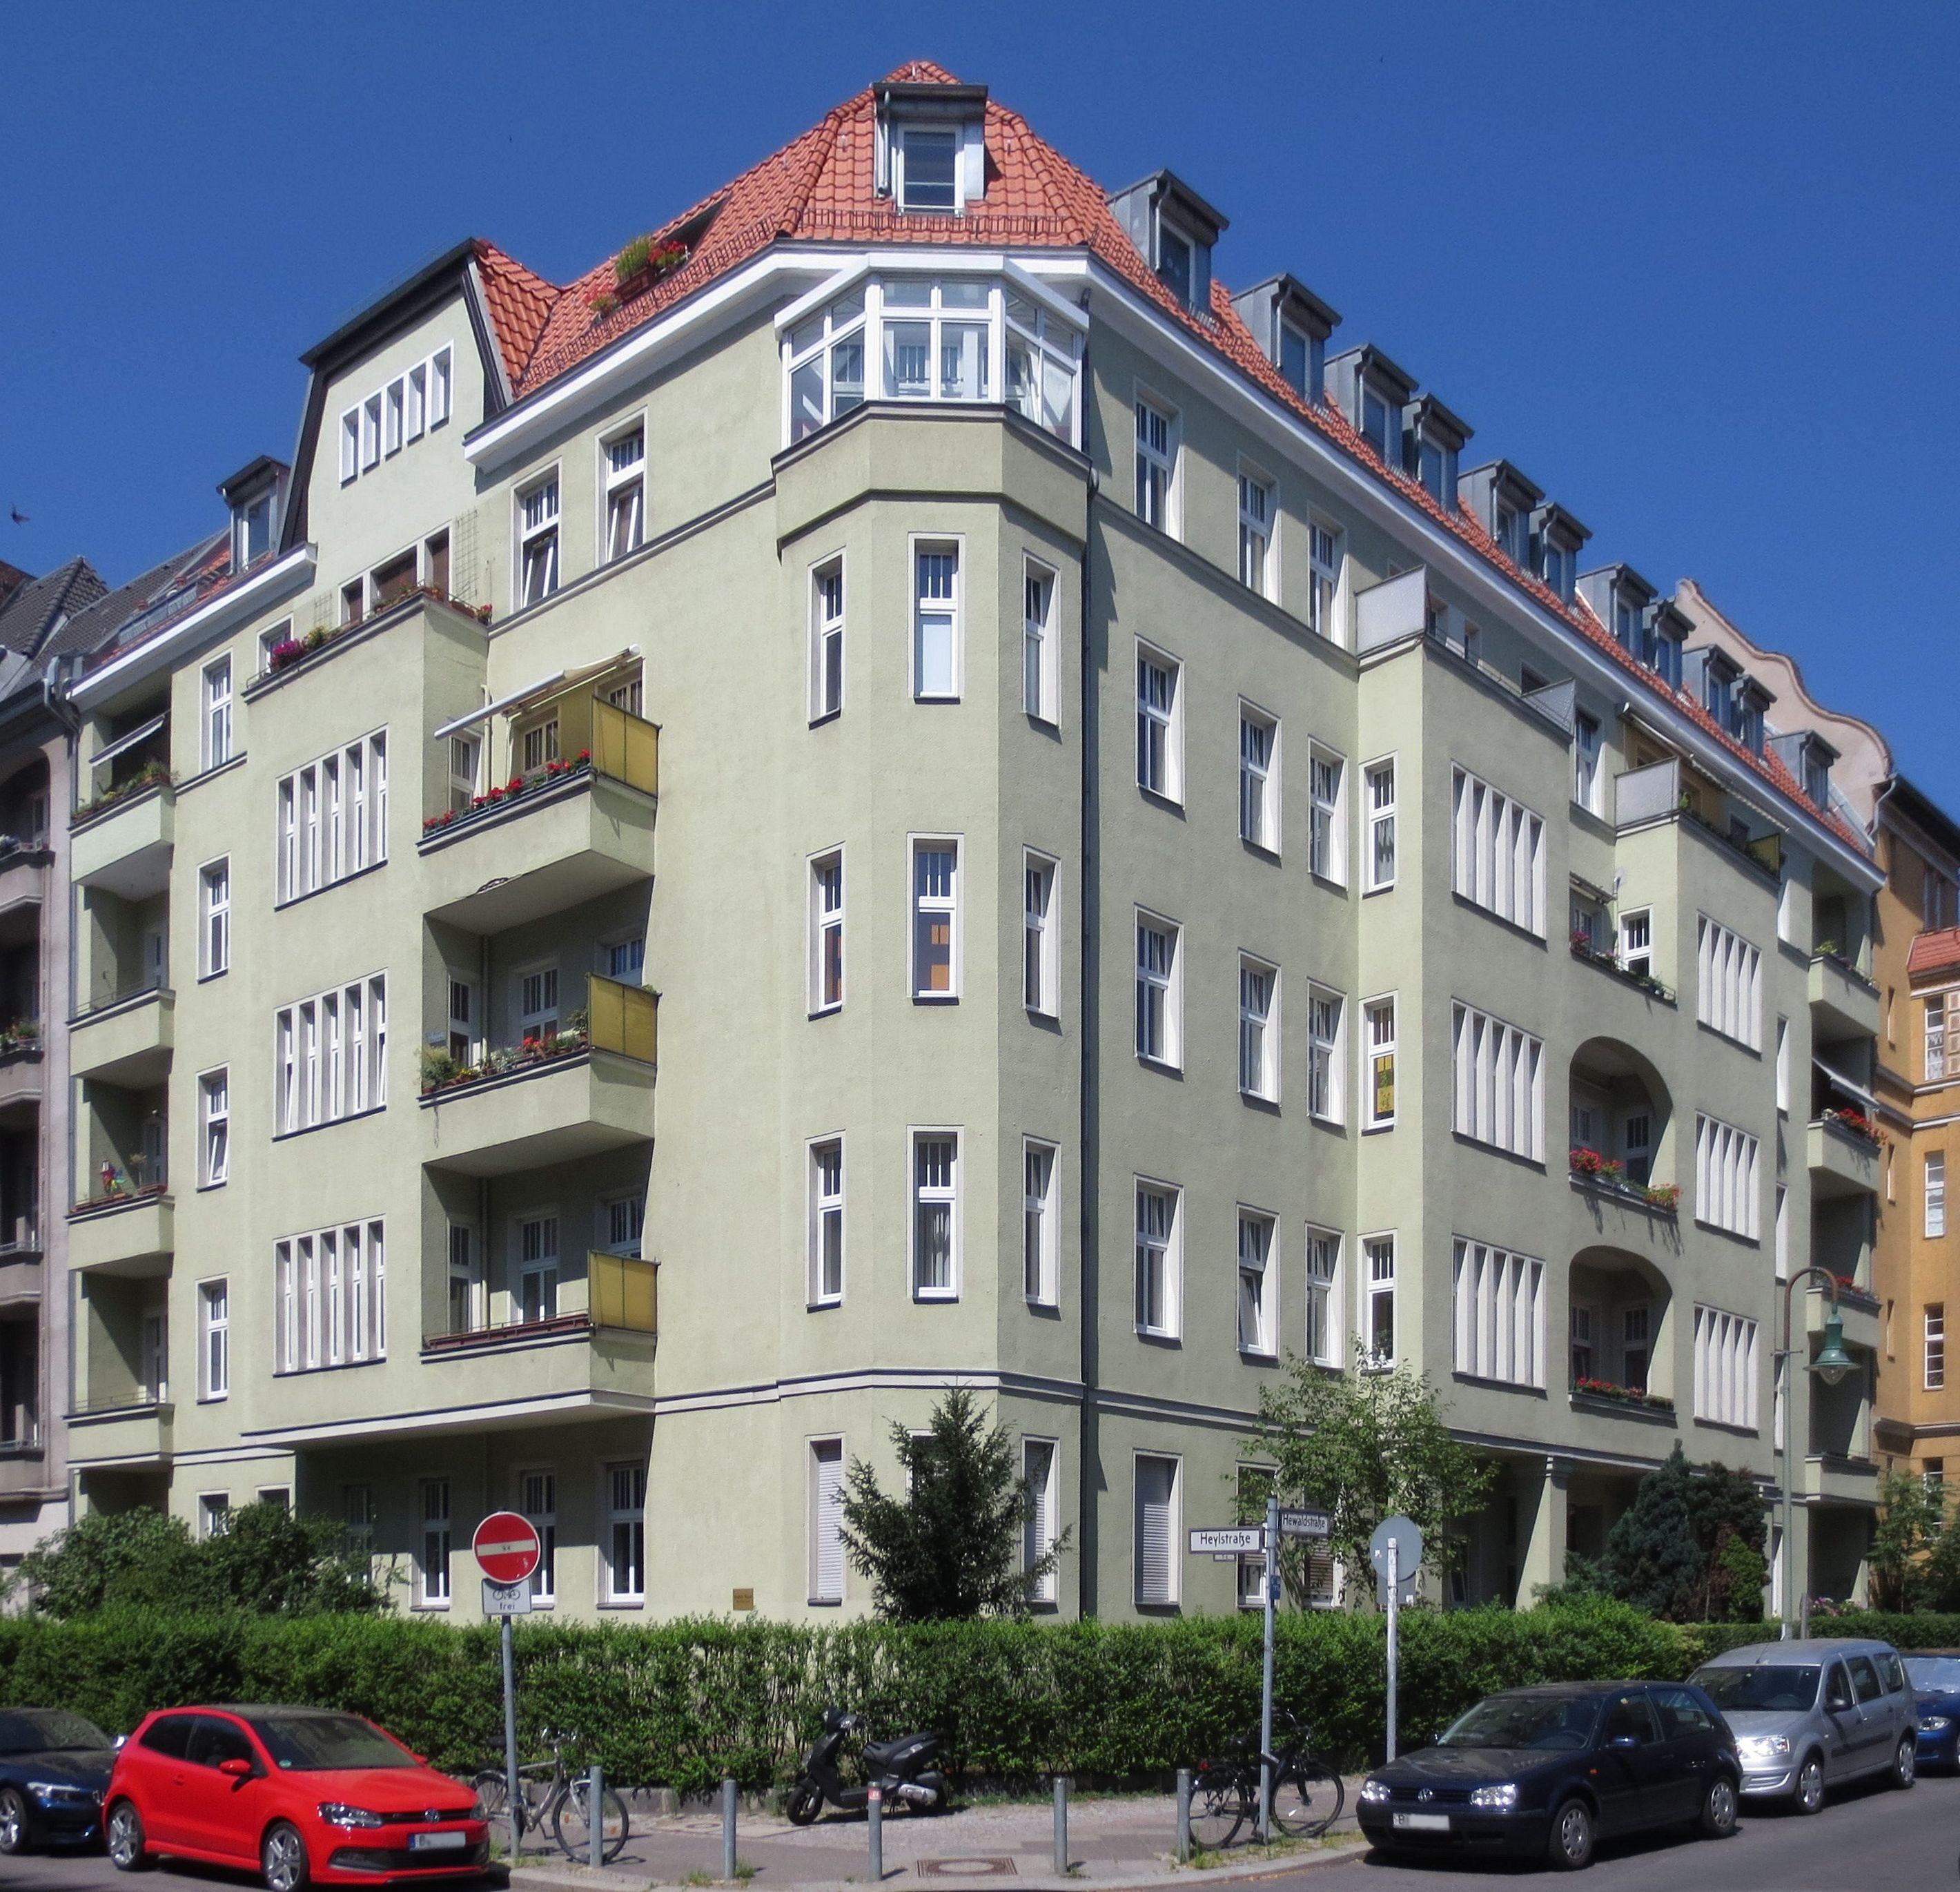 file berlin schoeneberg hewaldstrasse 6 wikimedia commons. Black Bedroom Furniture Sets. Home Design Ideas